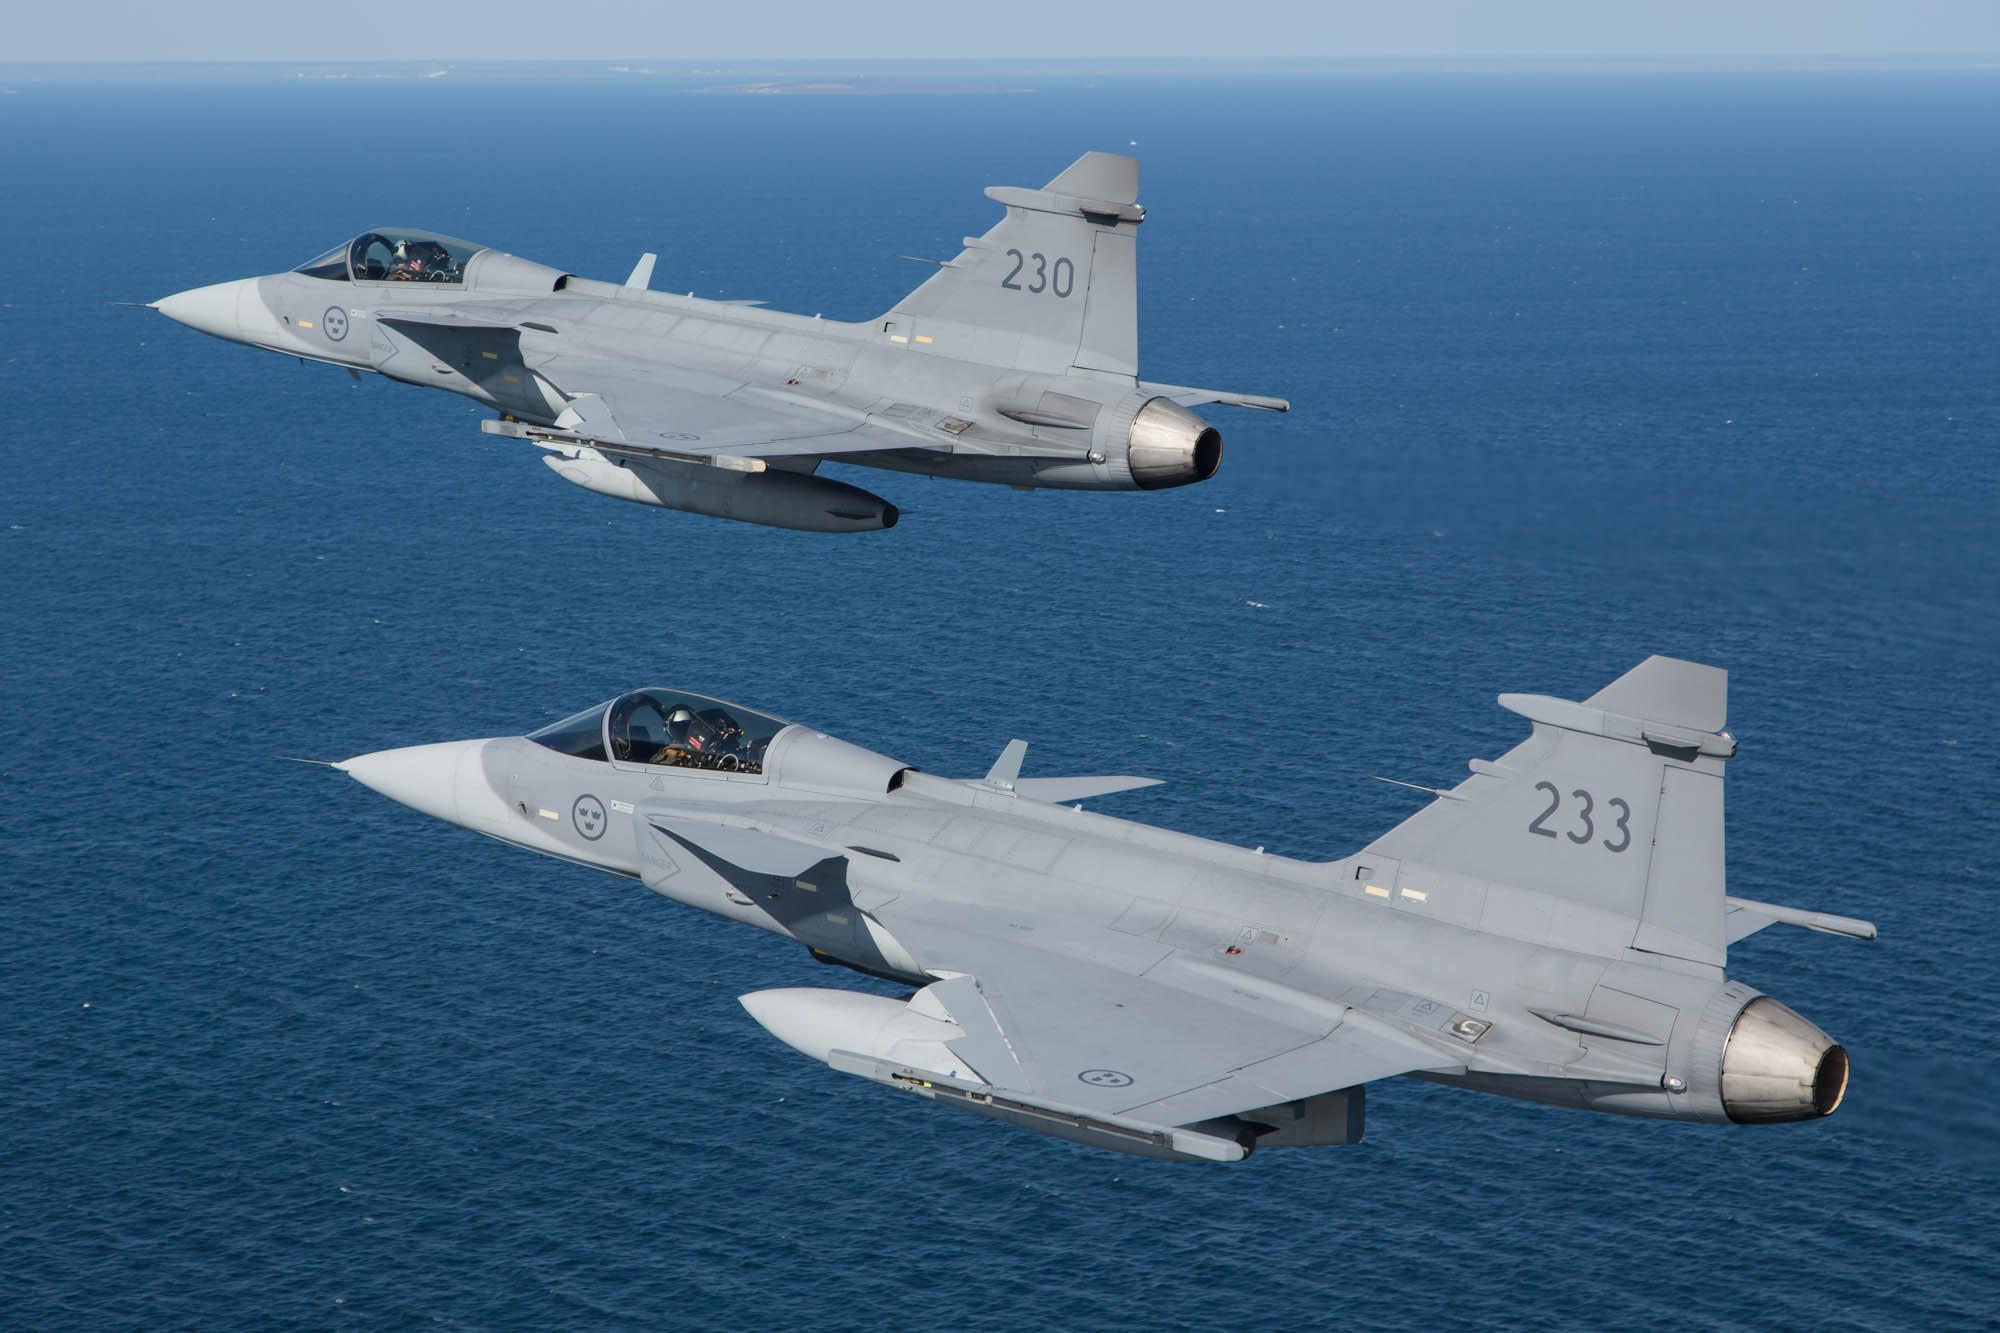 Aviation Photography Swedish Air Force (Flygvapnet), Gripen